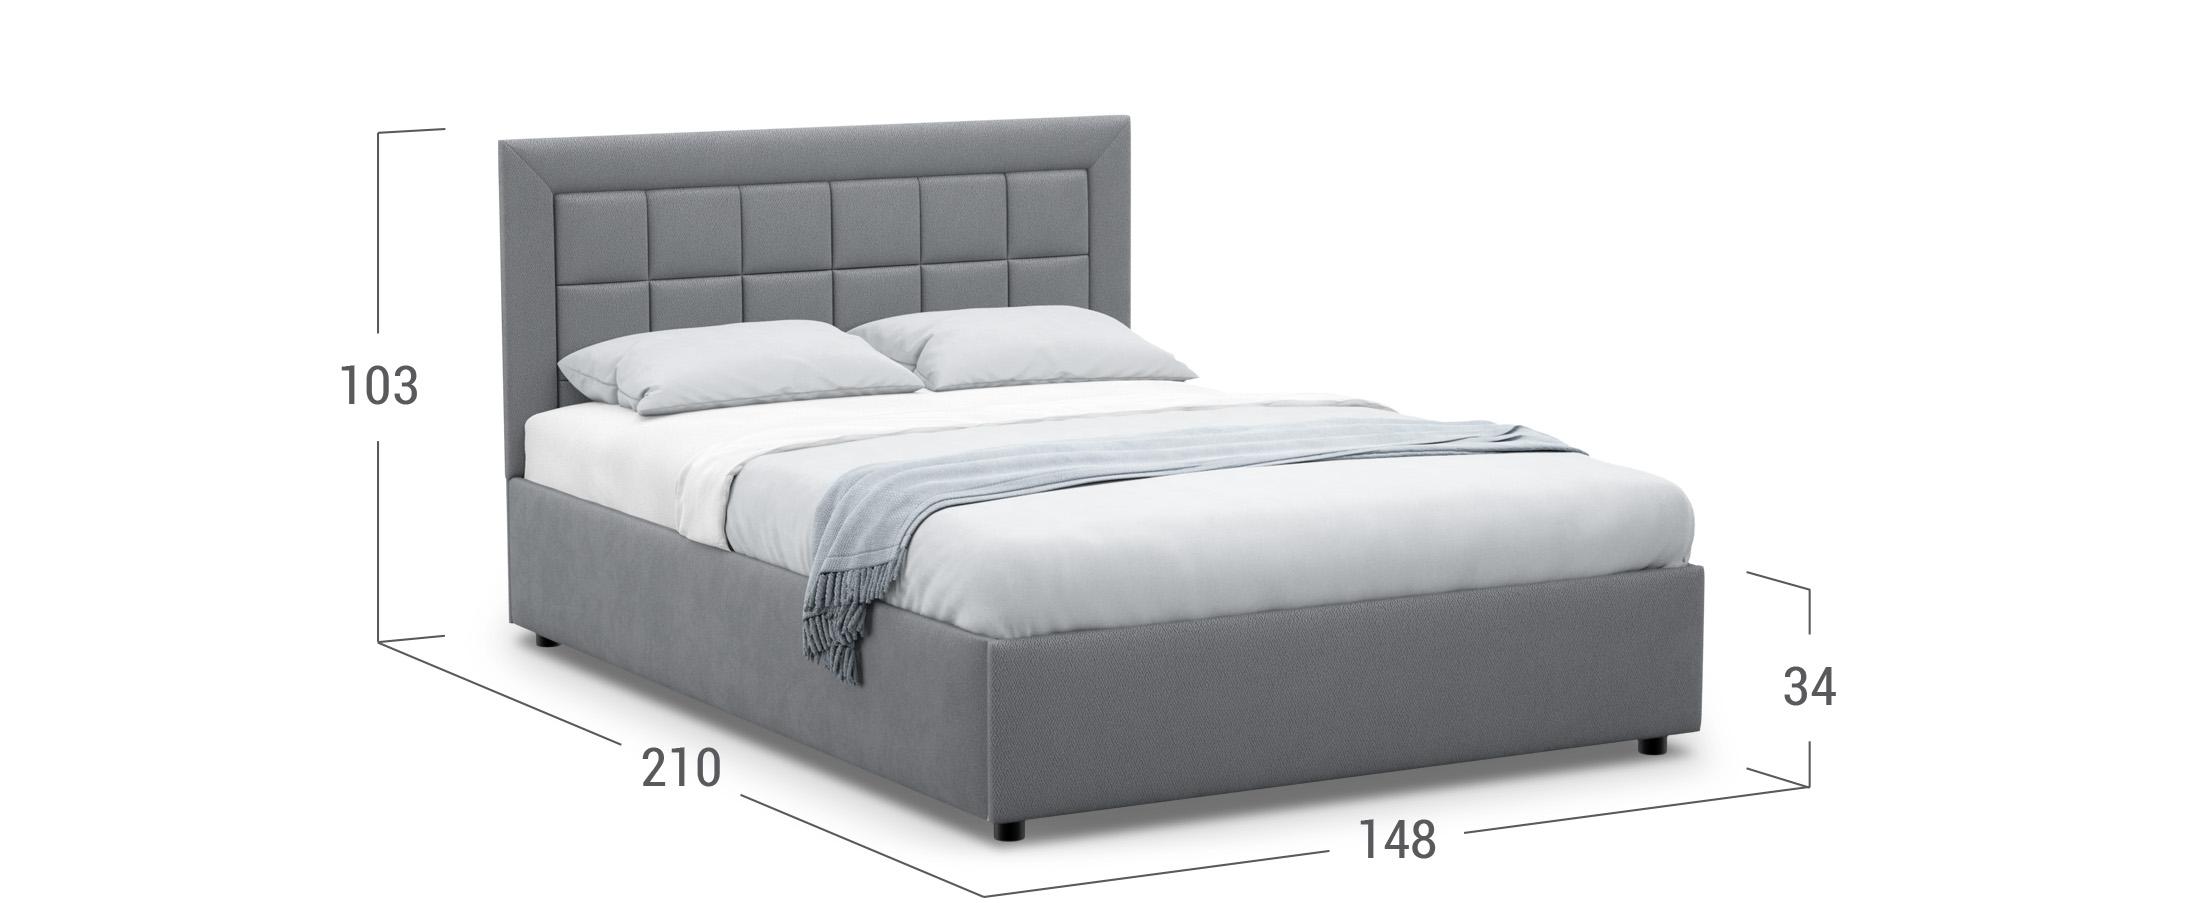 Кровать двуспальная Noemi New 140х200 Модель 1222